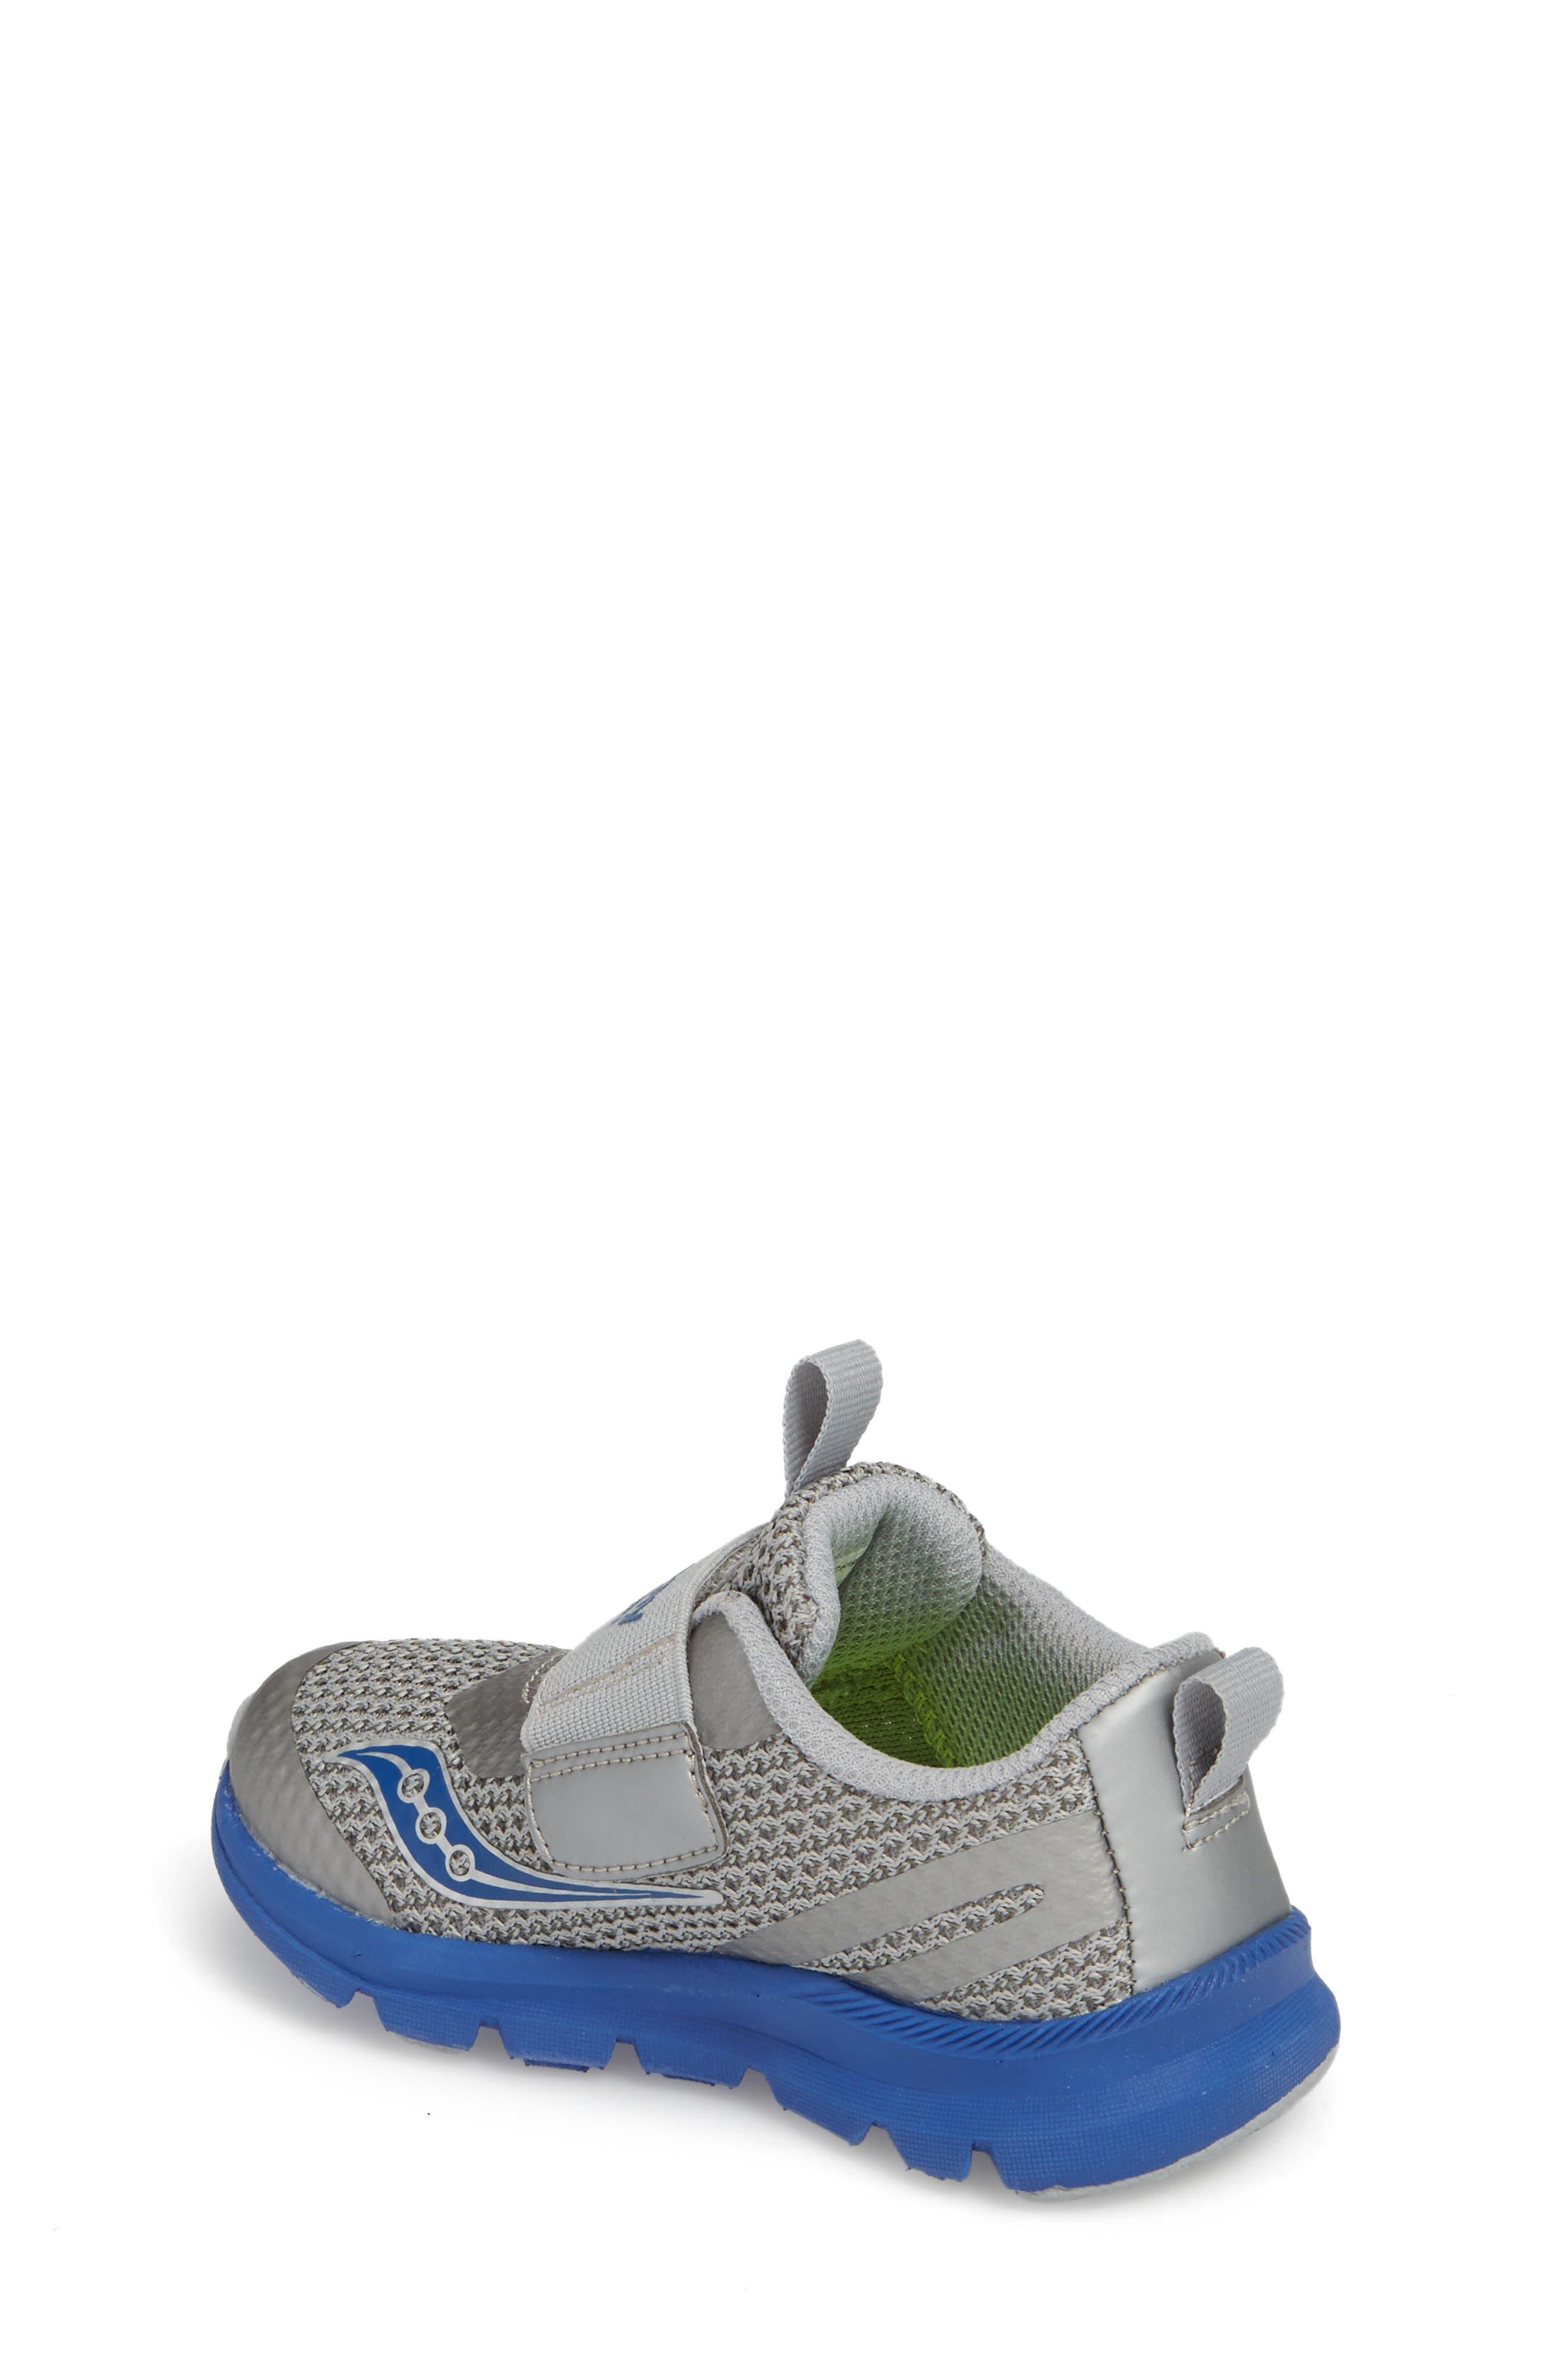 Baby Liteform Sneaker,                             Alternate thumbnail 2, color,                             Grey/ Blue